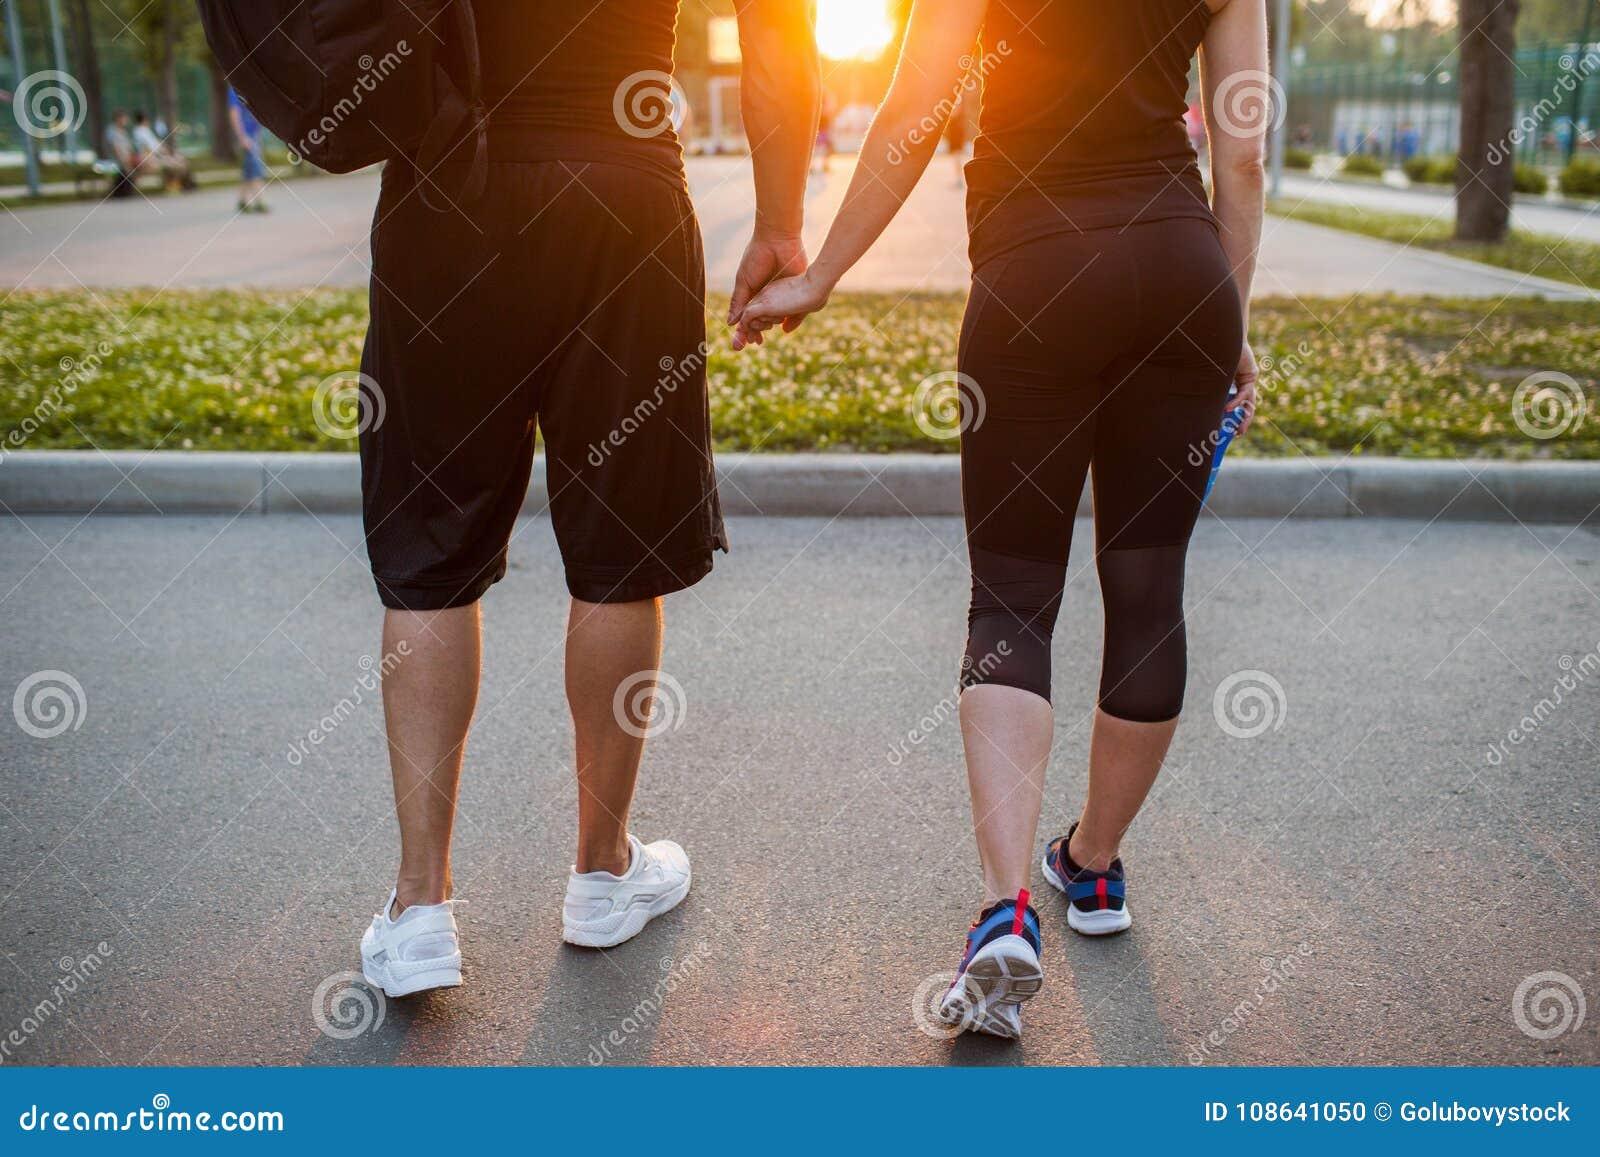 Sportsman dating site